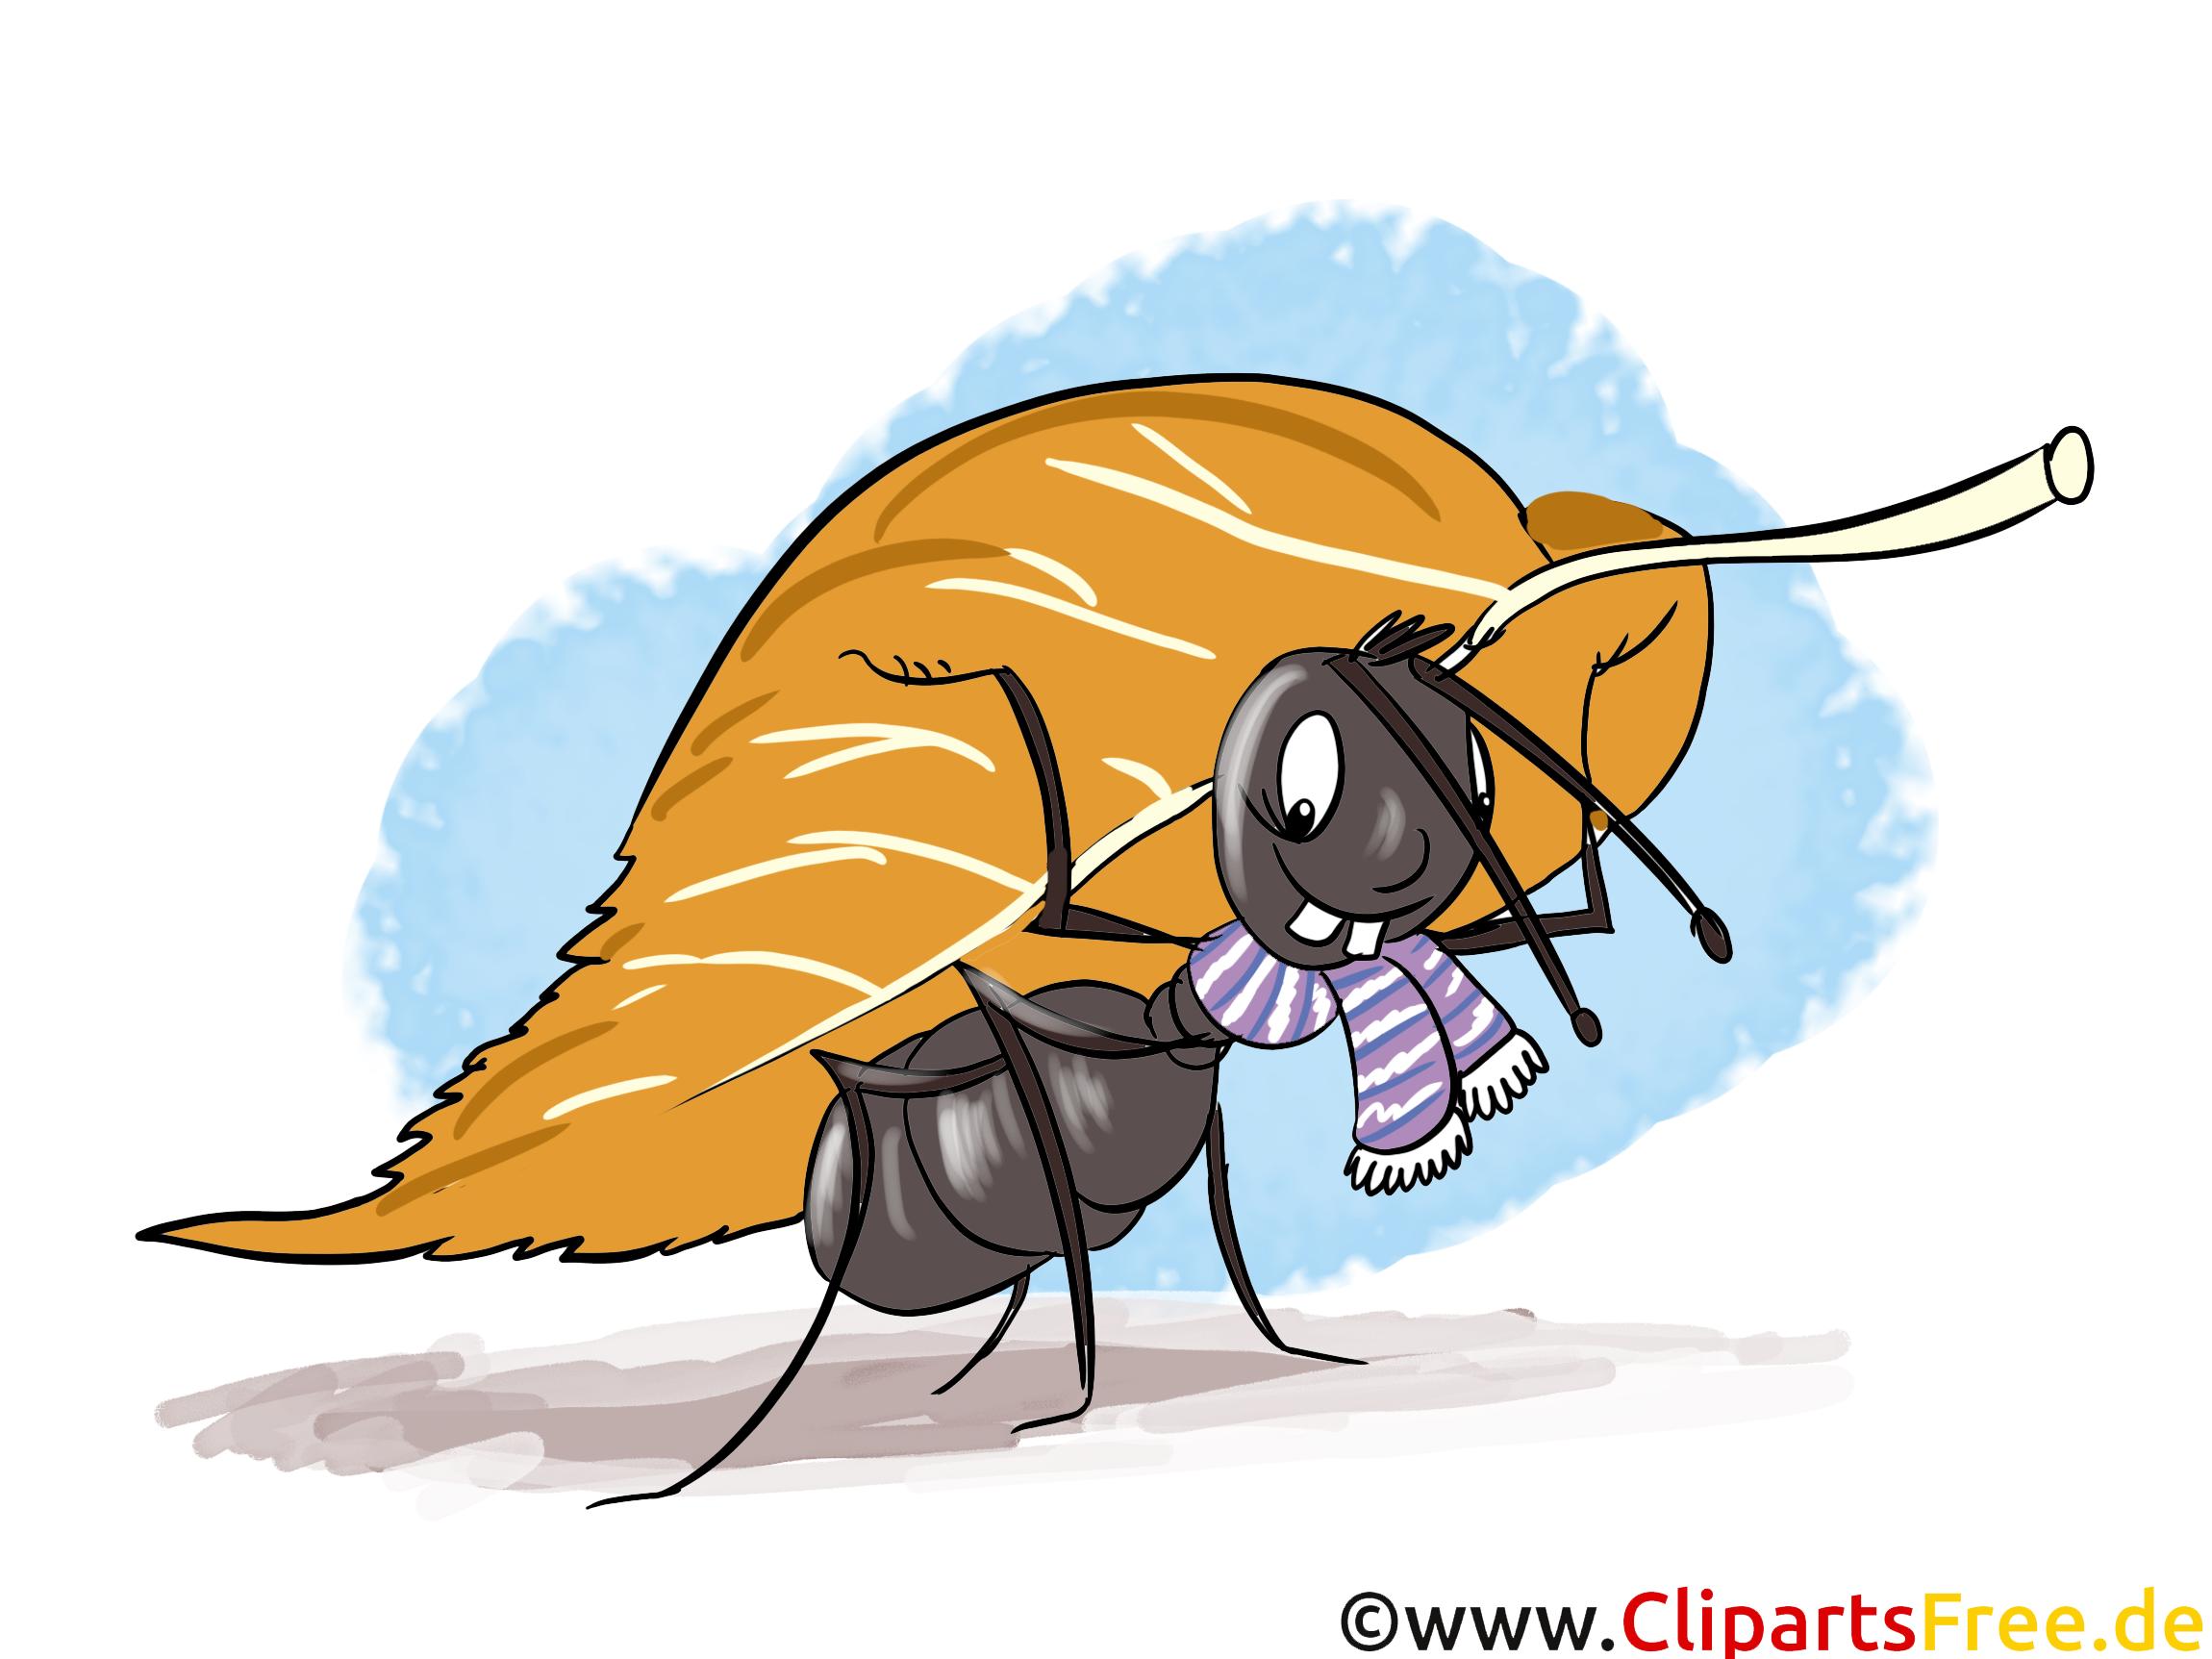 Kinderbuchillustration Ameise mit Baumblatt